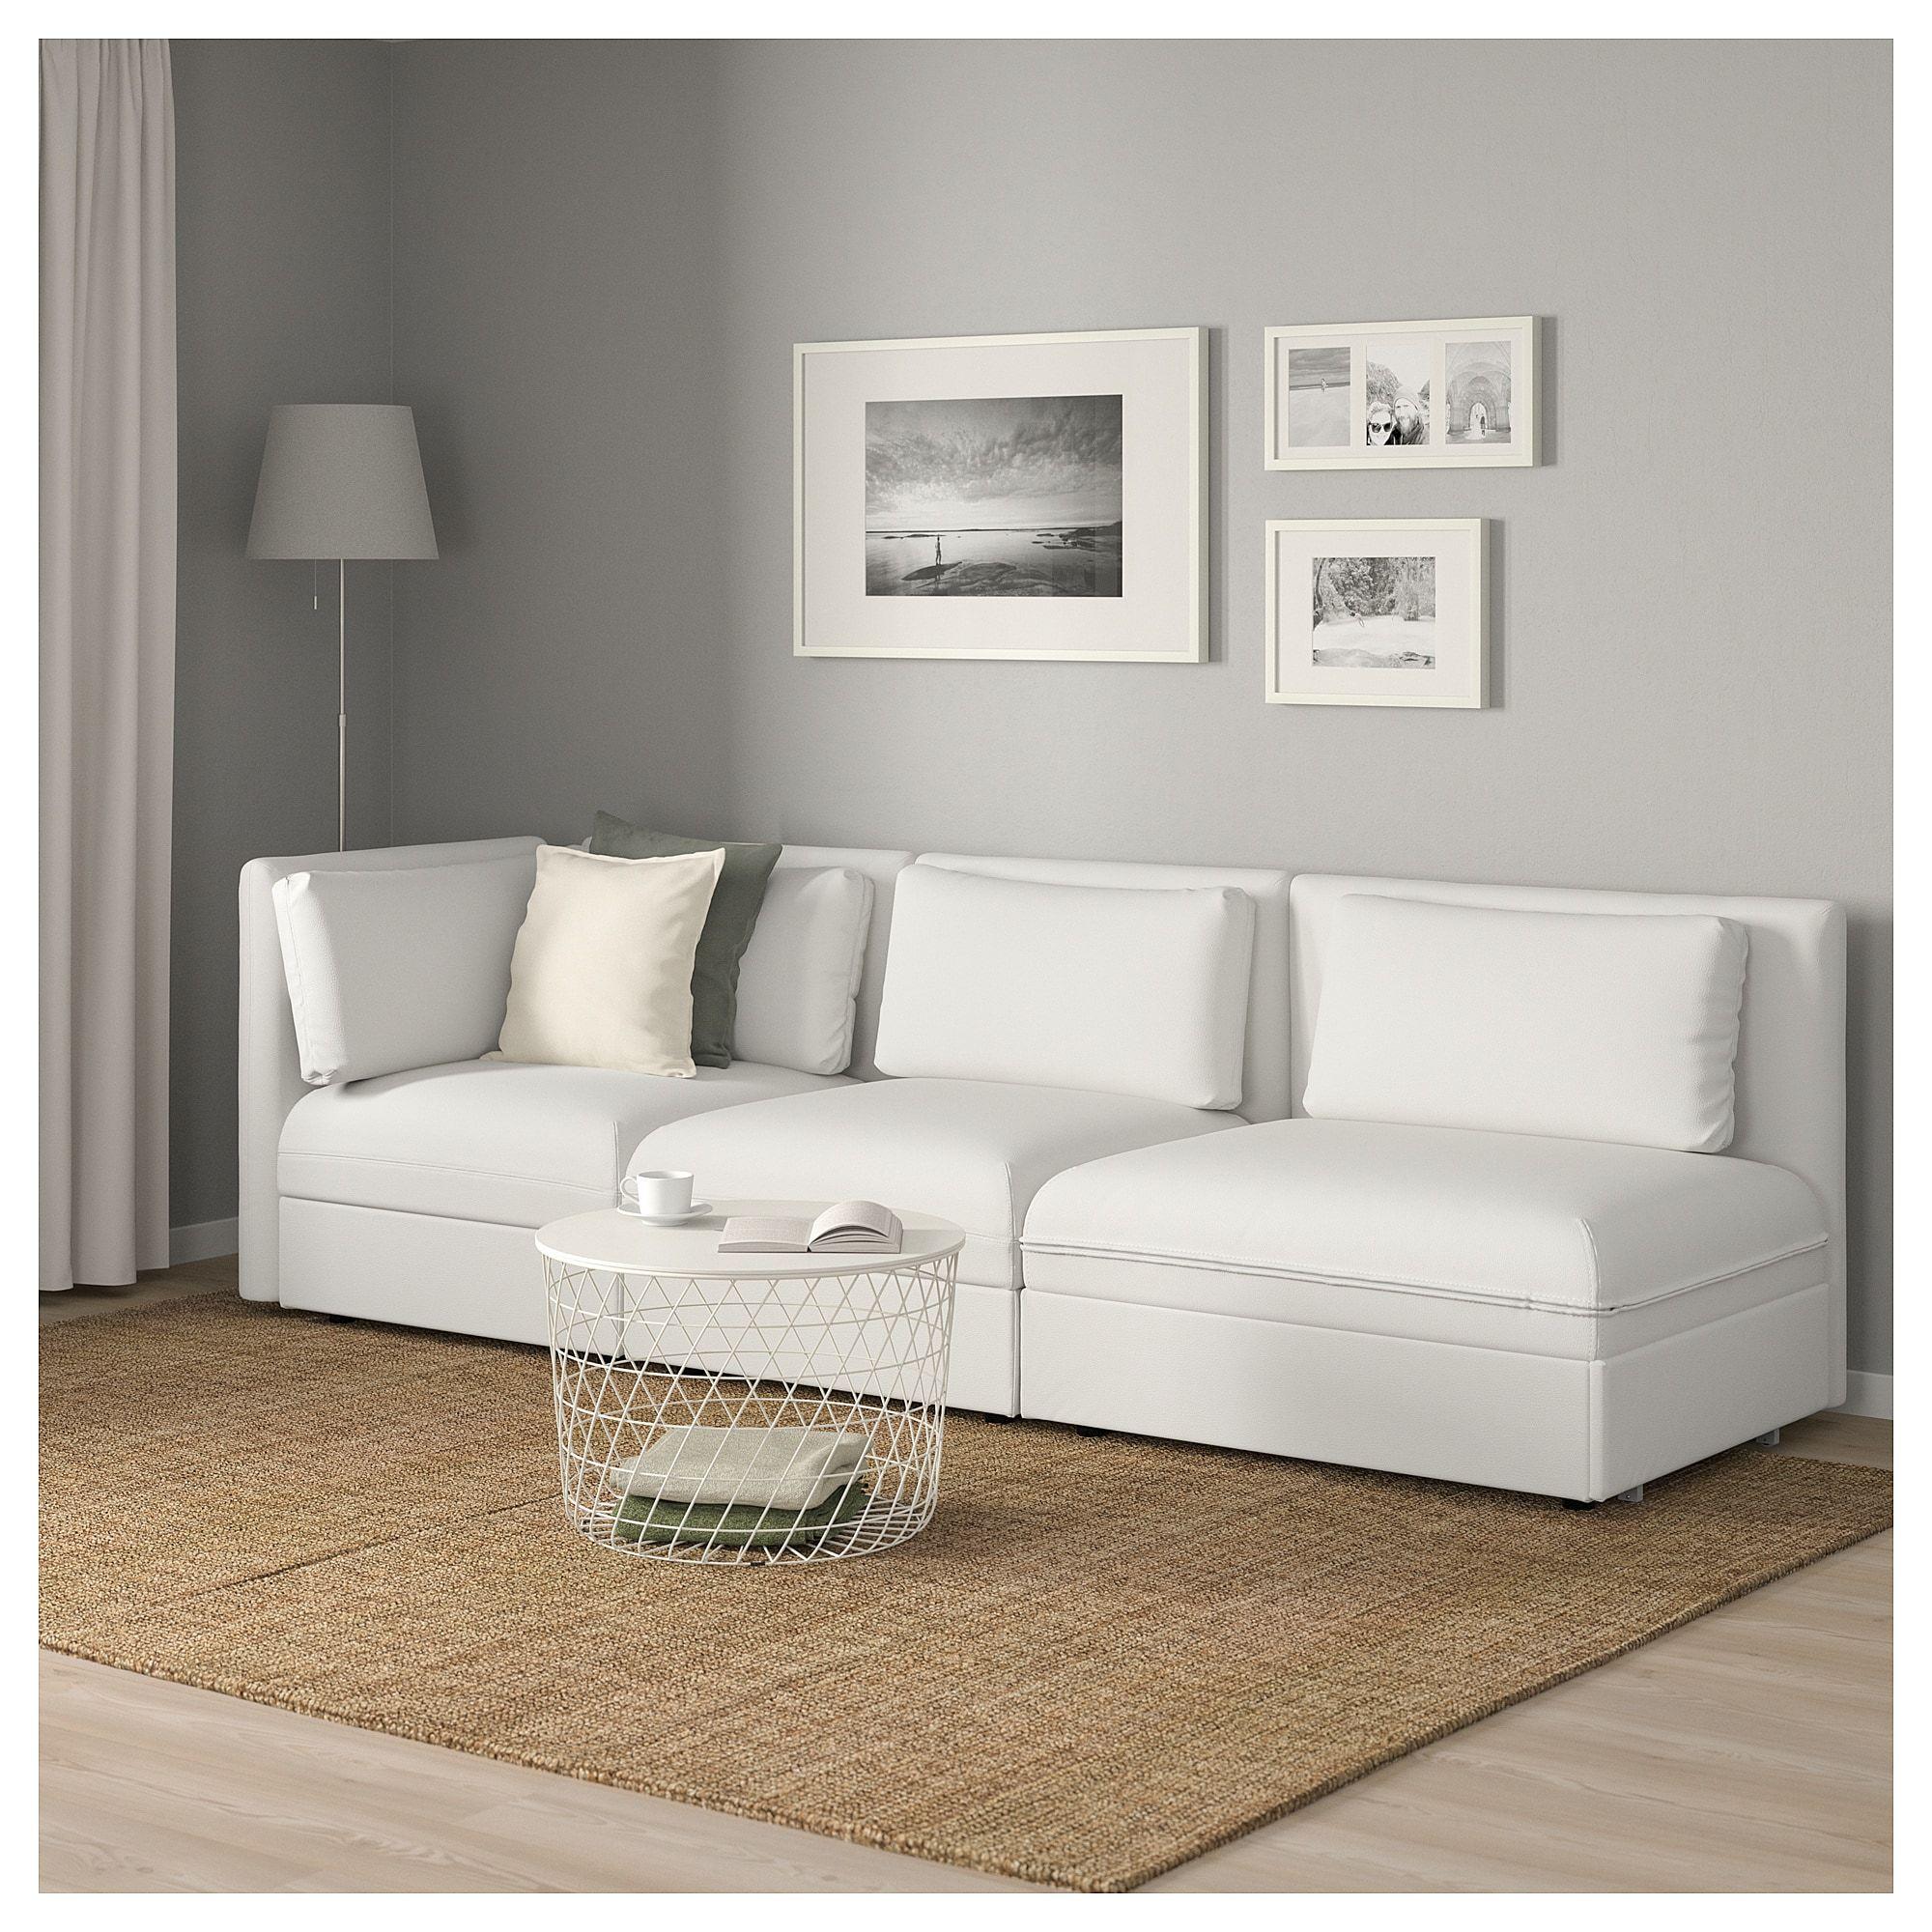 Bankstellen Seats En Sofa.3 Seat Modular Sleeper Sofa Vallentuna With Open End Murum